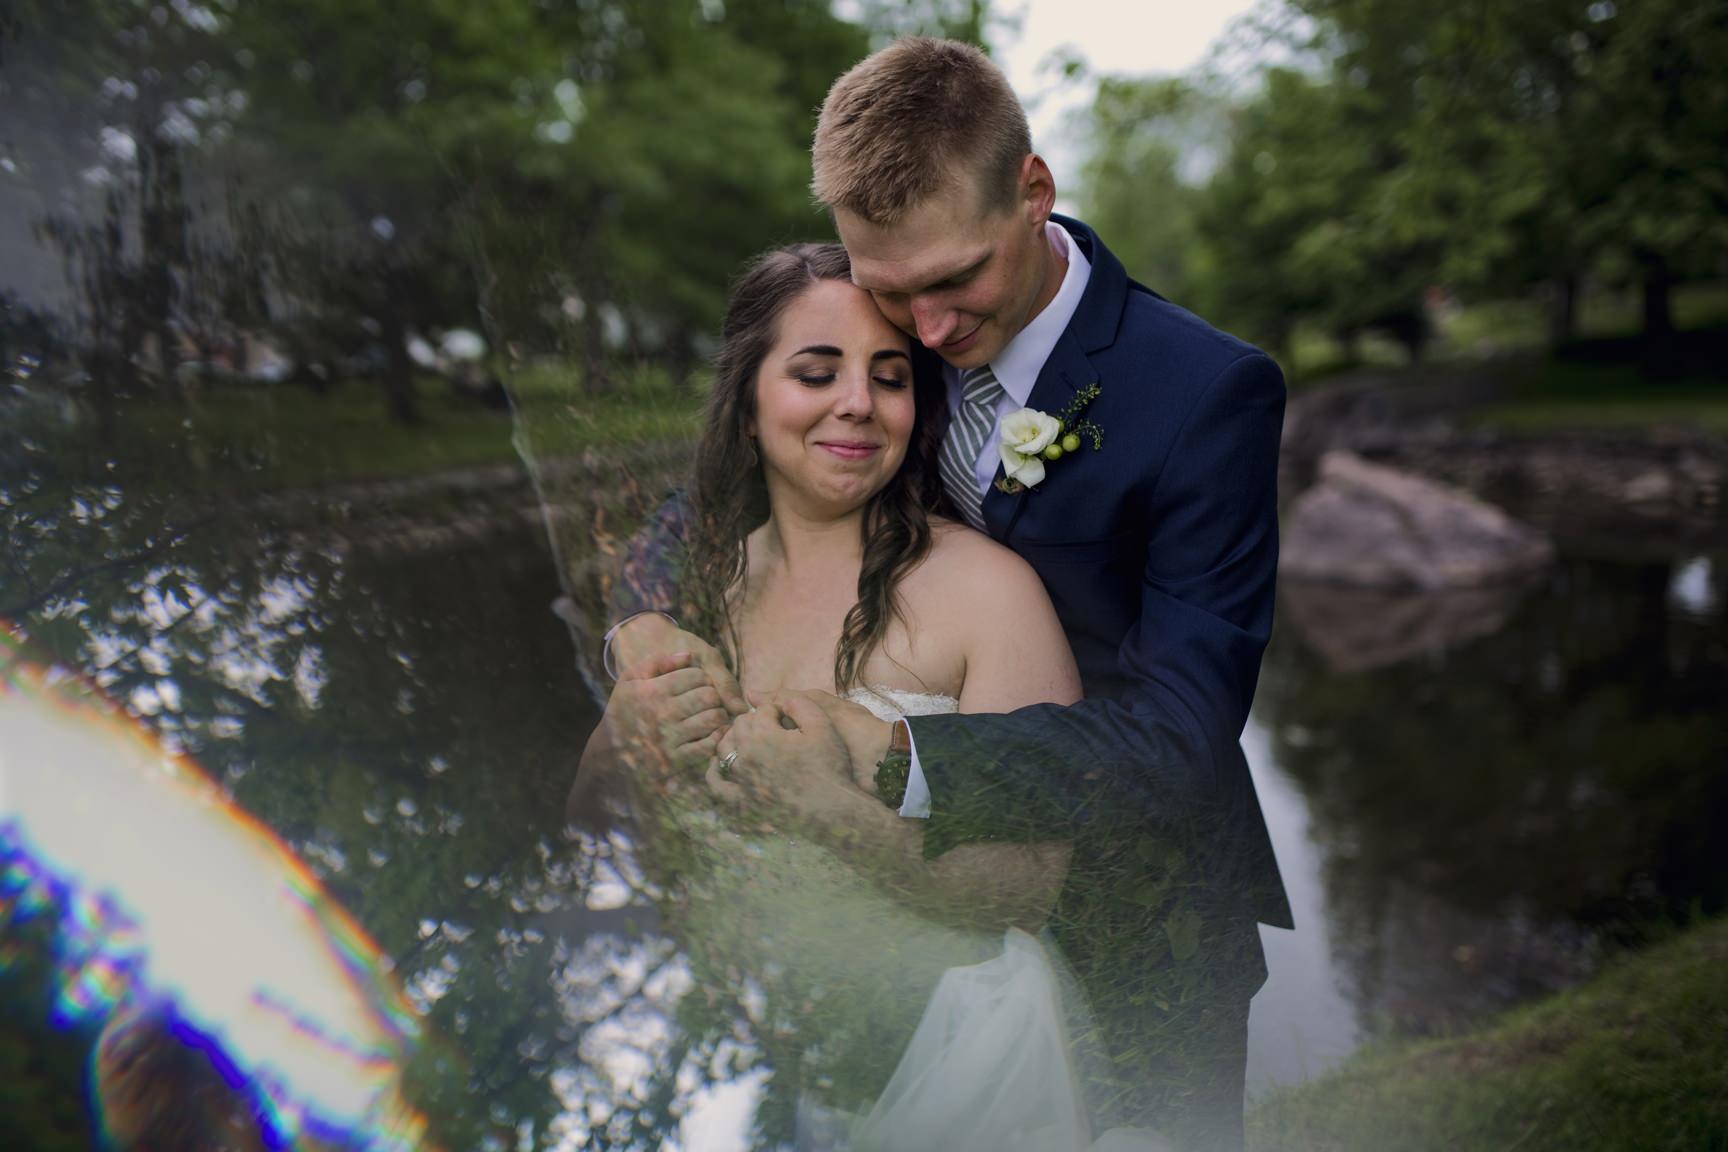 Perth Wedding in Stewart Park by Ottawa Wedding Photographer Joey Rudd Photography Prism Prisming Interesting Creative